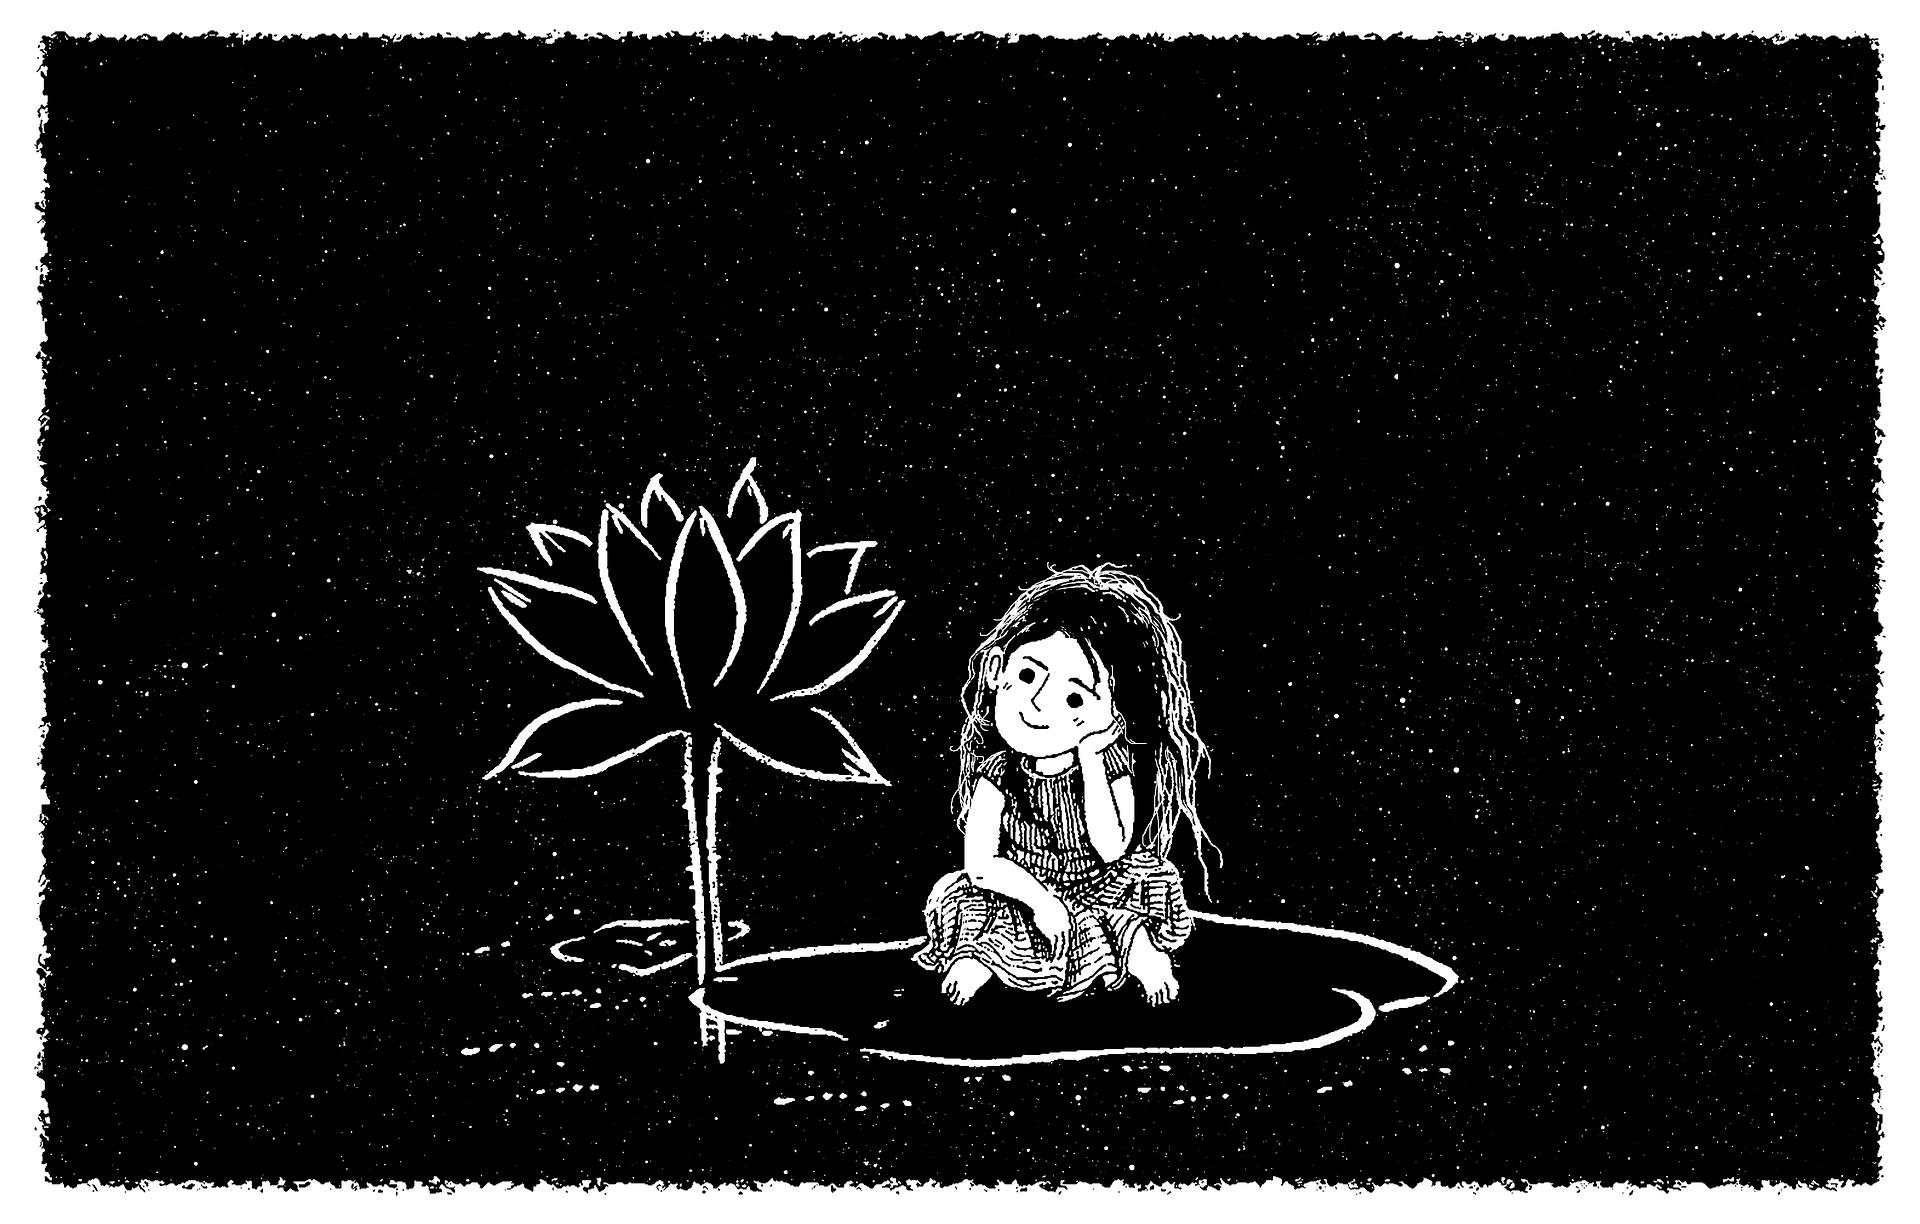 fairy-tale-1182696_1920